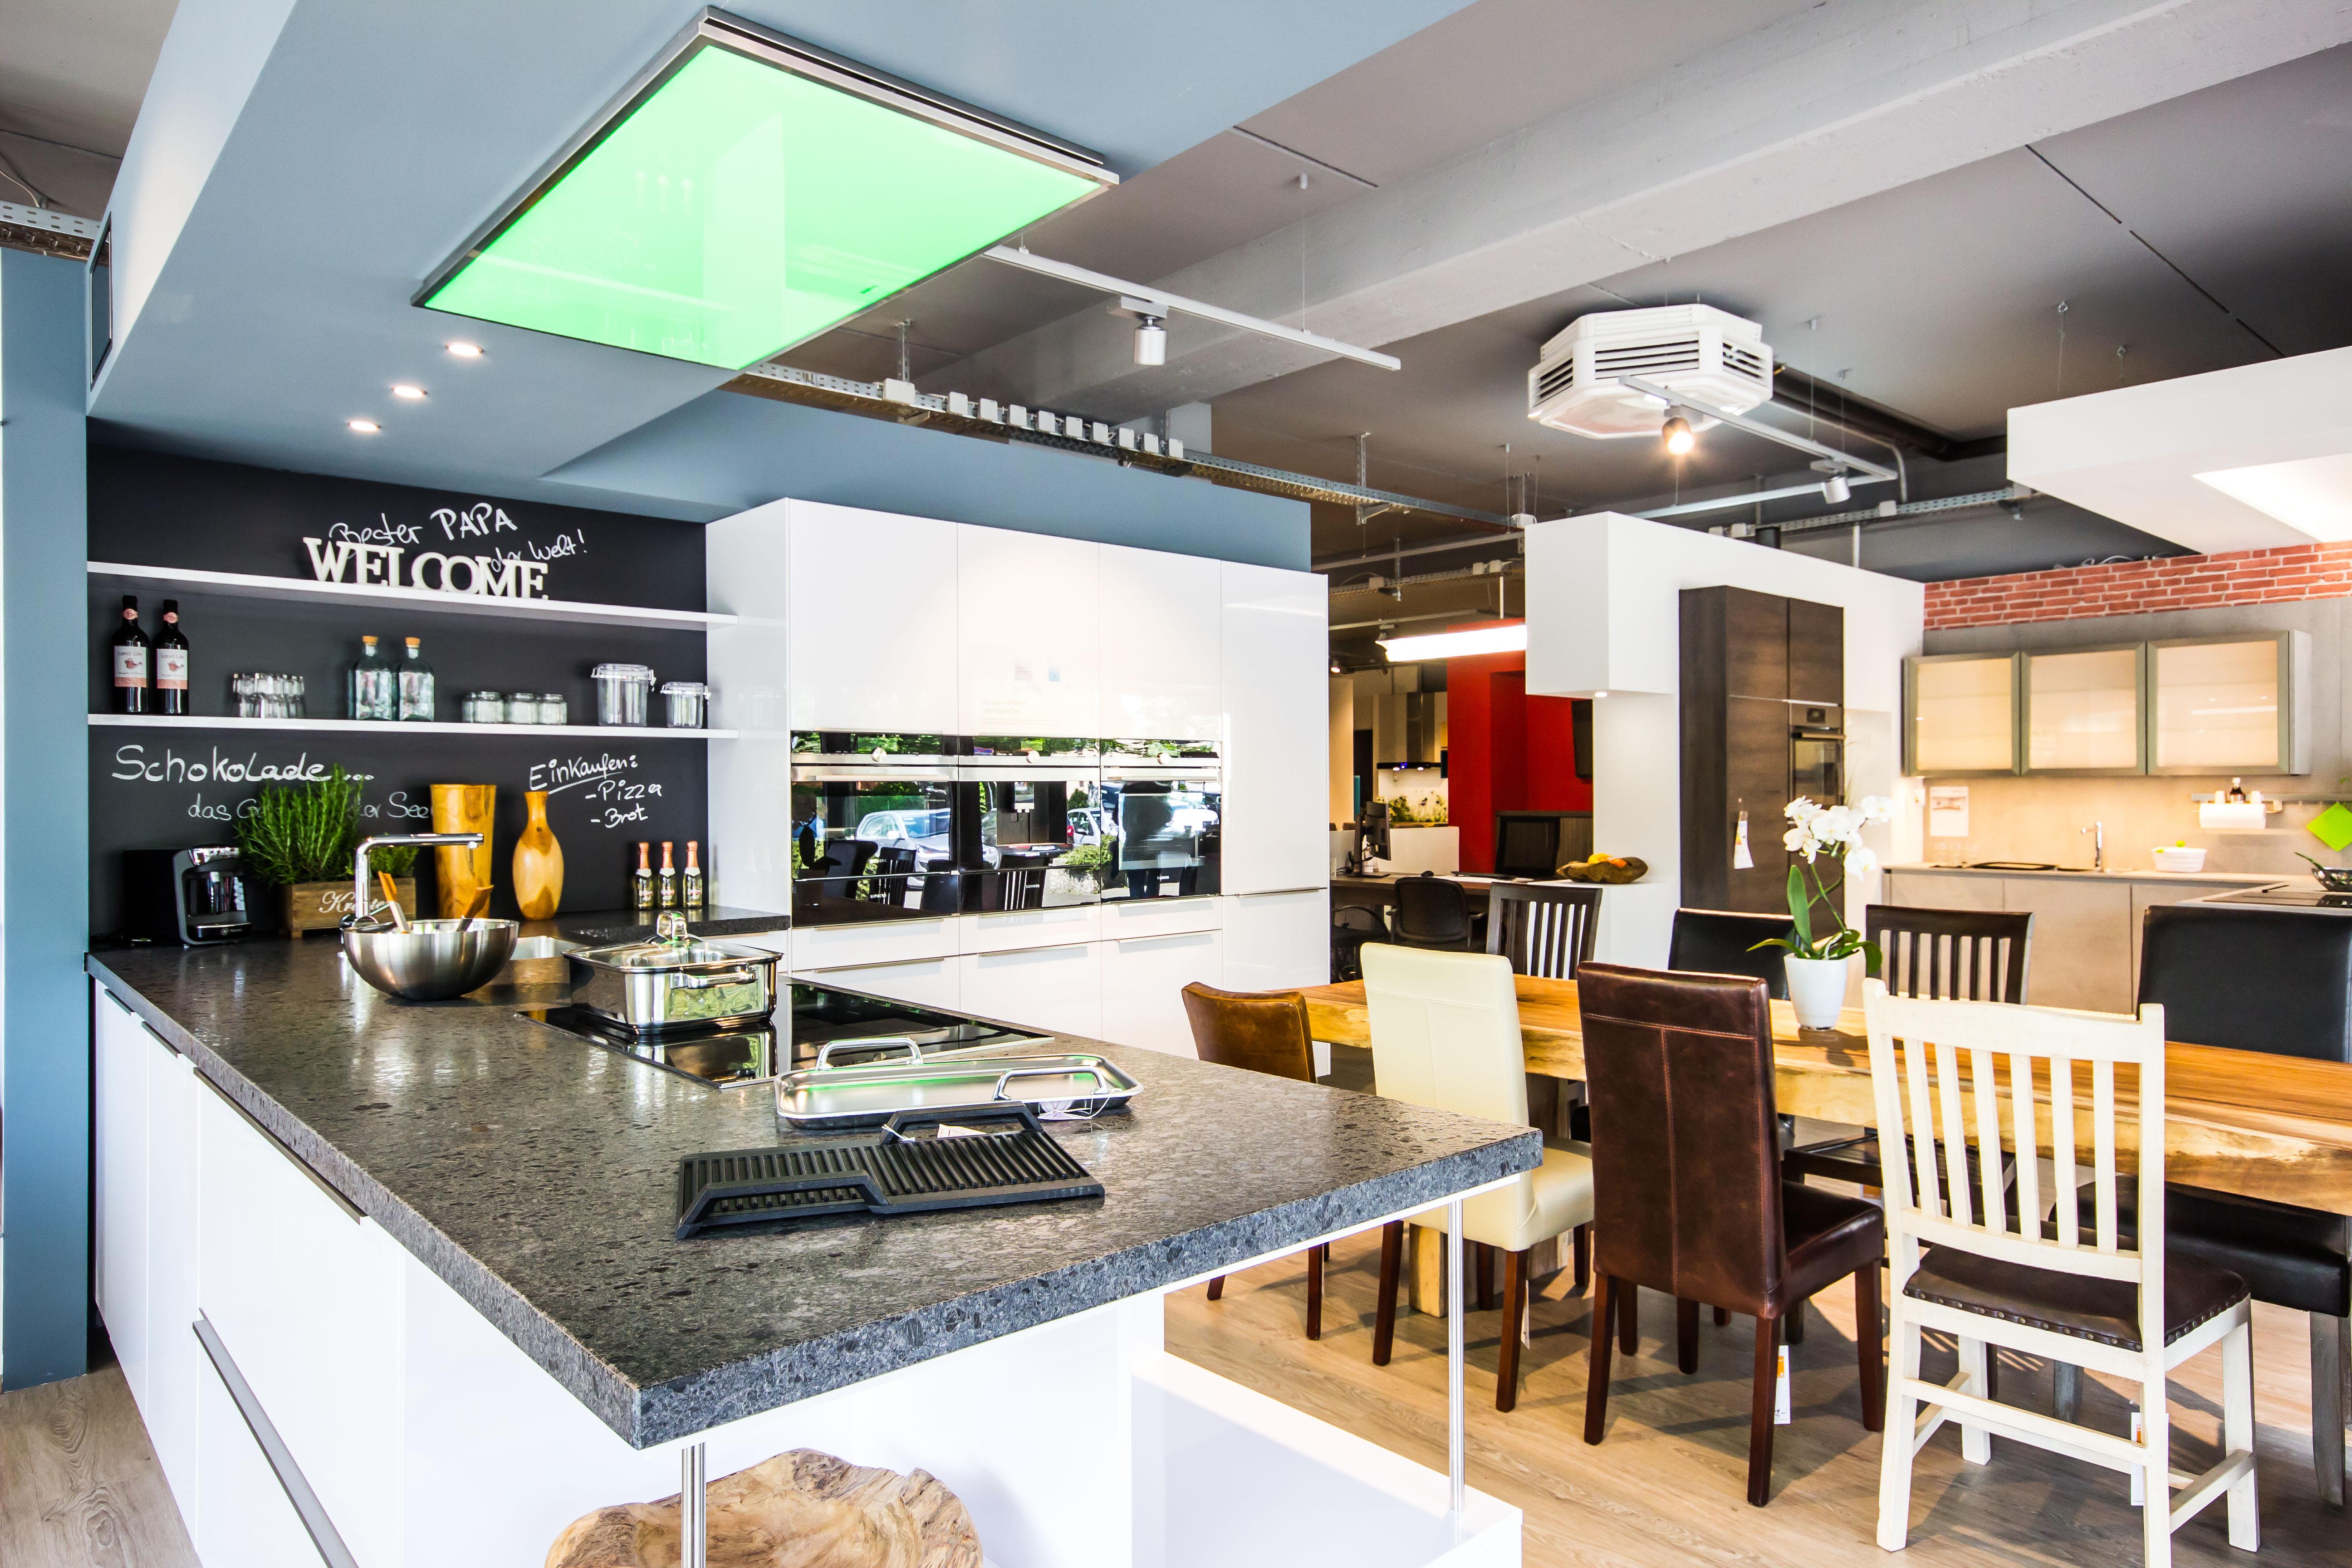 k che co hamburg rahlstedt hamburg kontaktieren. Black Bedroom Furniture Sets. Home Design Ideas